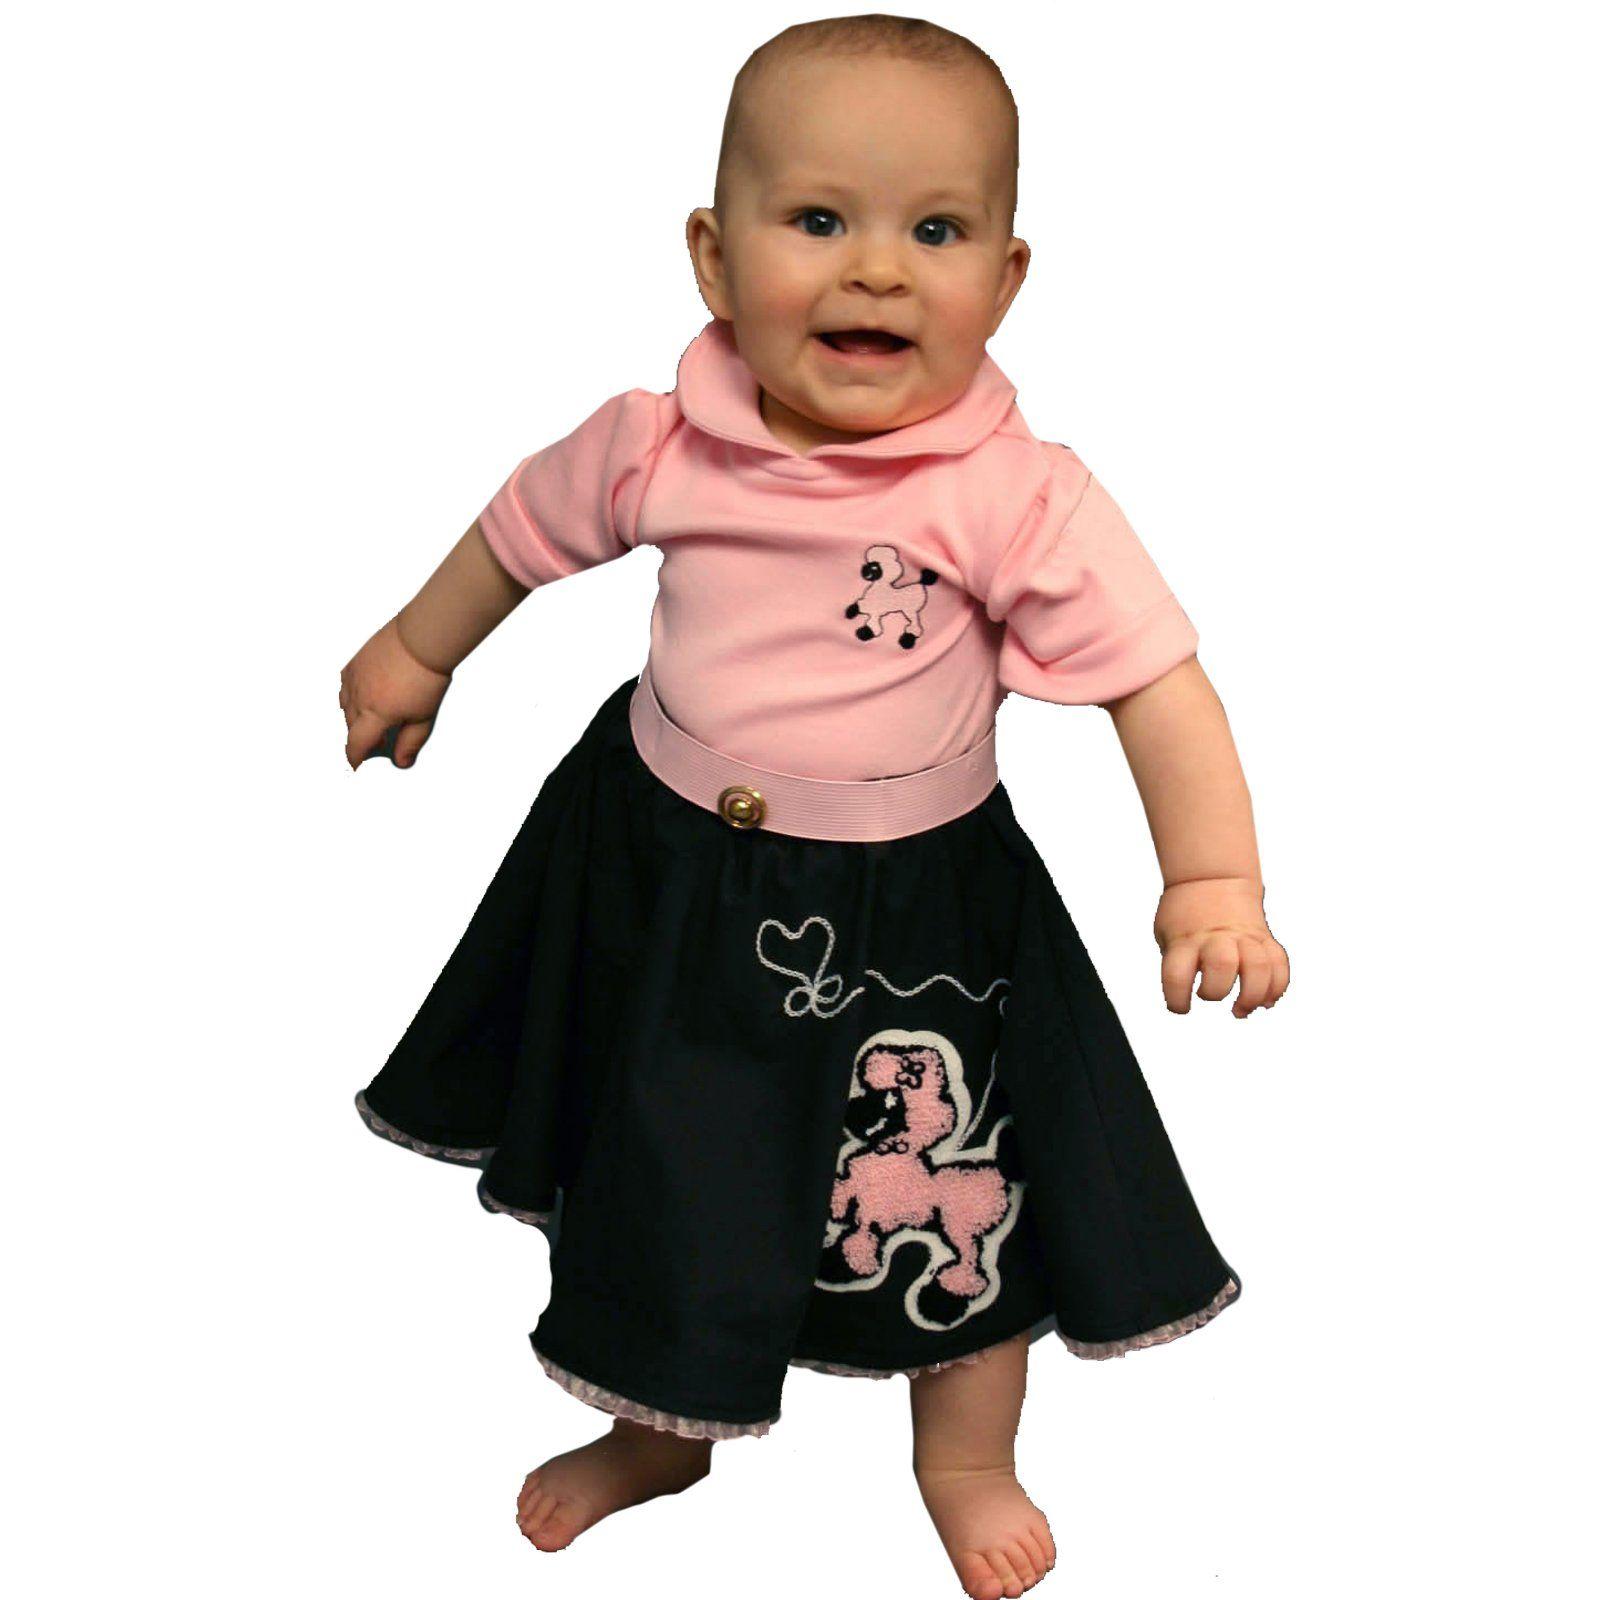 Daviinas Costume Bodysuit CostumeInfant CostumesPoodle SkirtsPoodlesPink